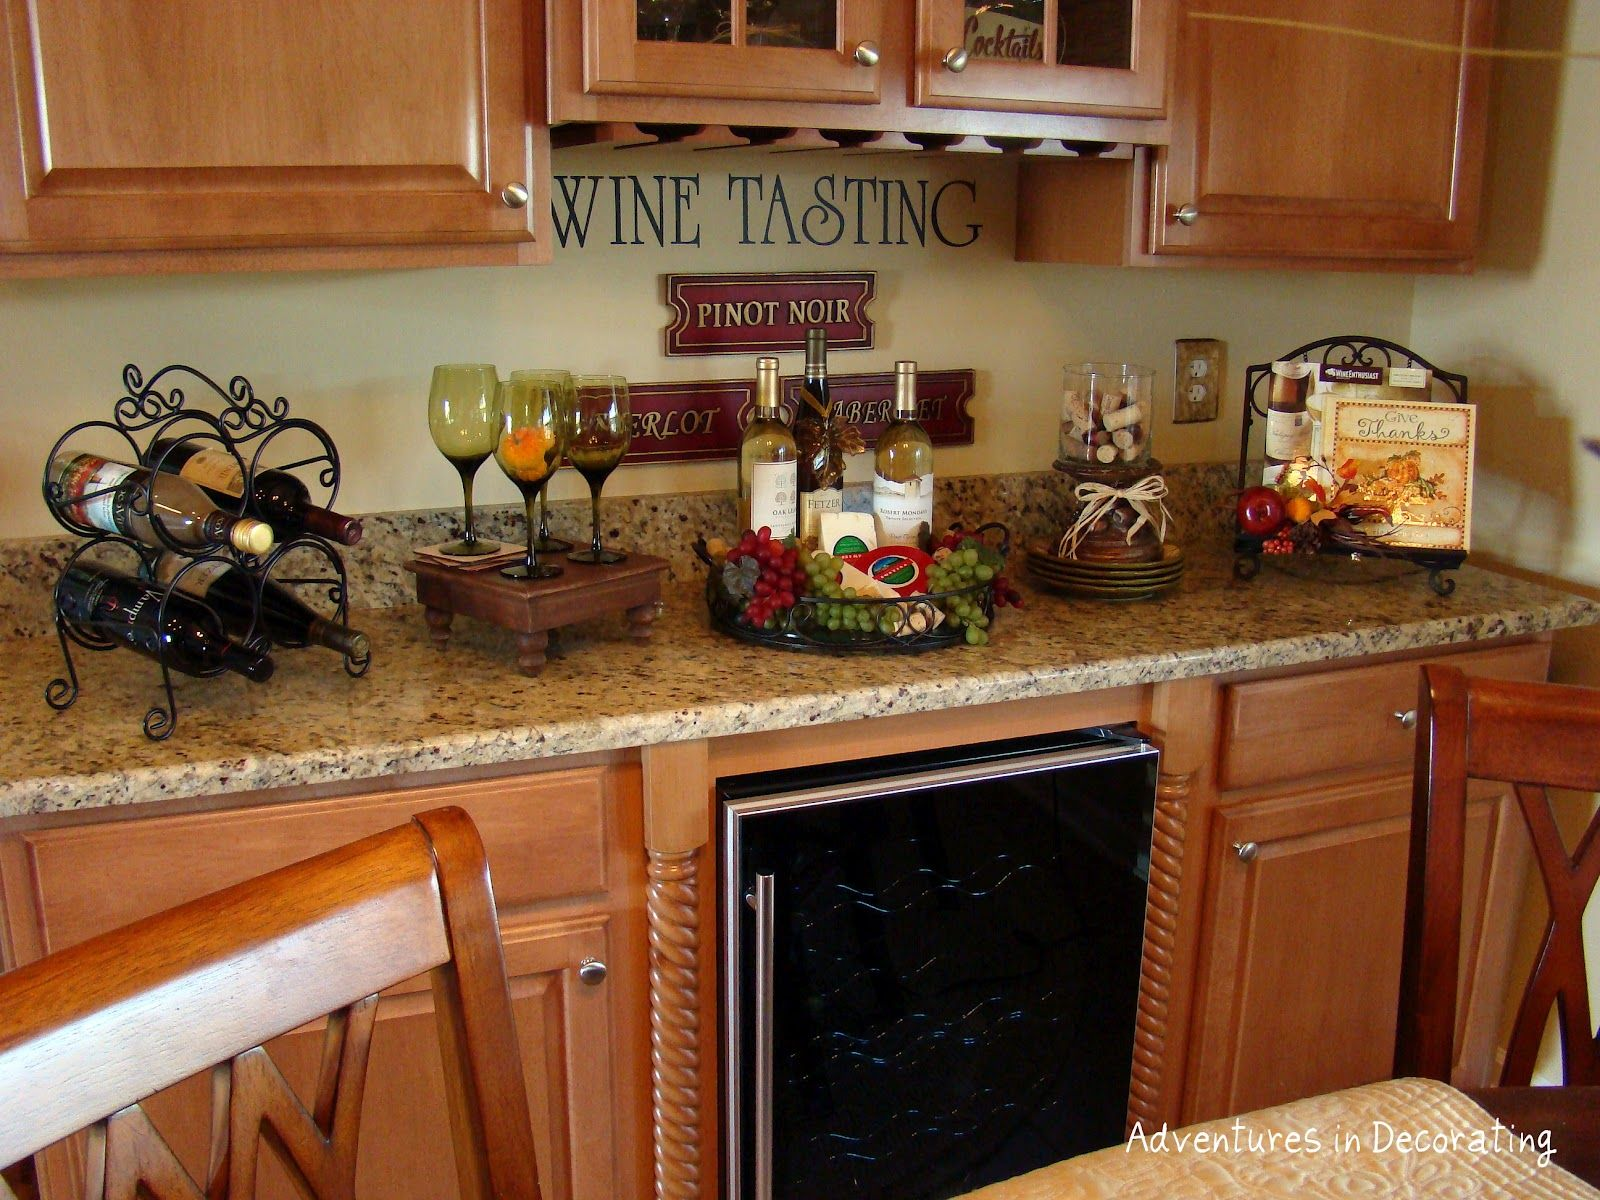 adventures in decorating | wine theme kitchen, grape kitchen decor, kitchen decor themes